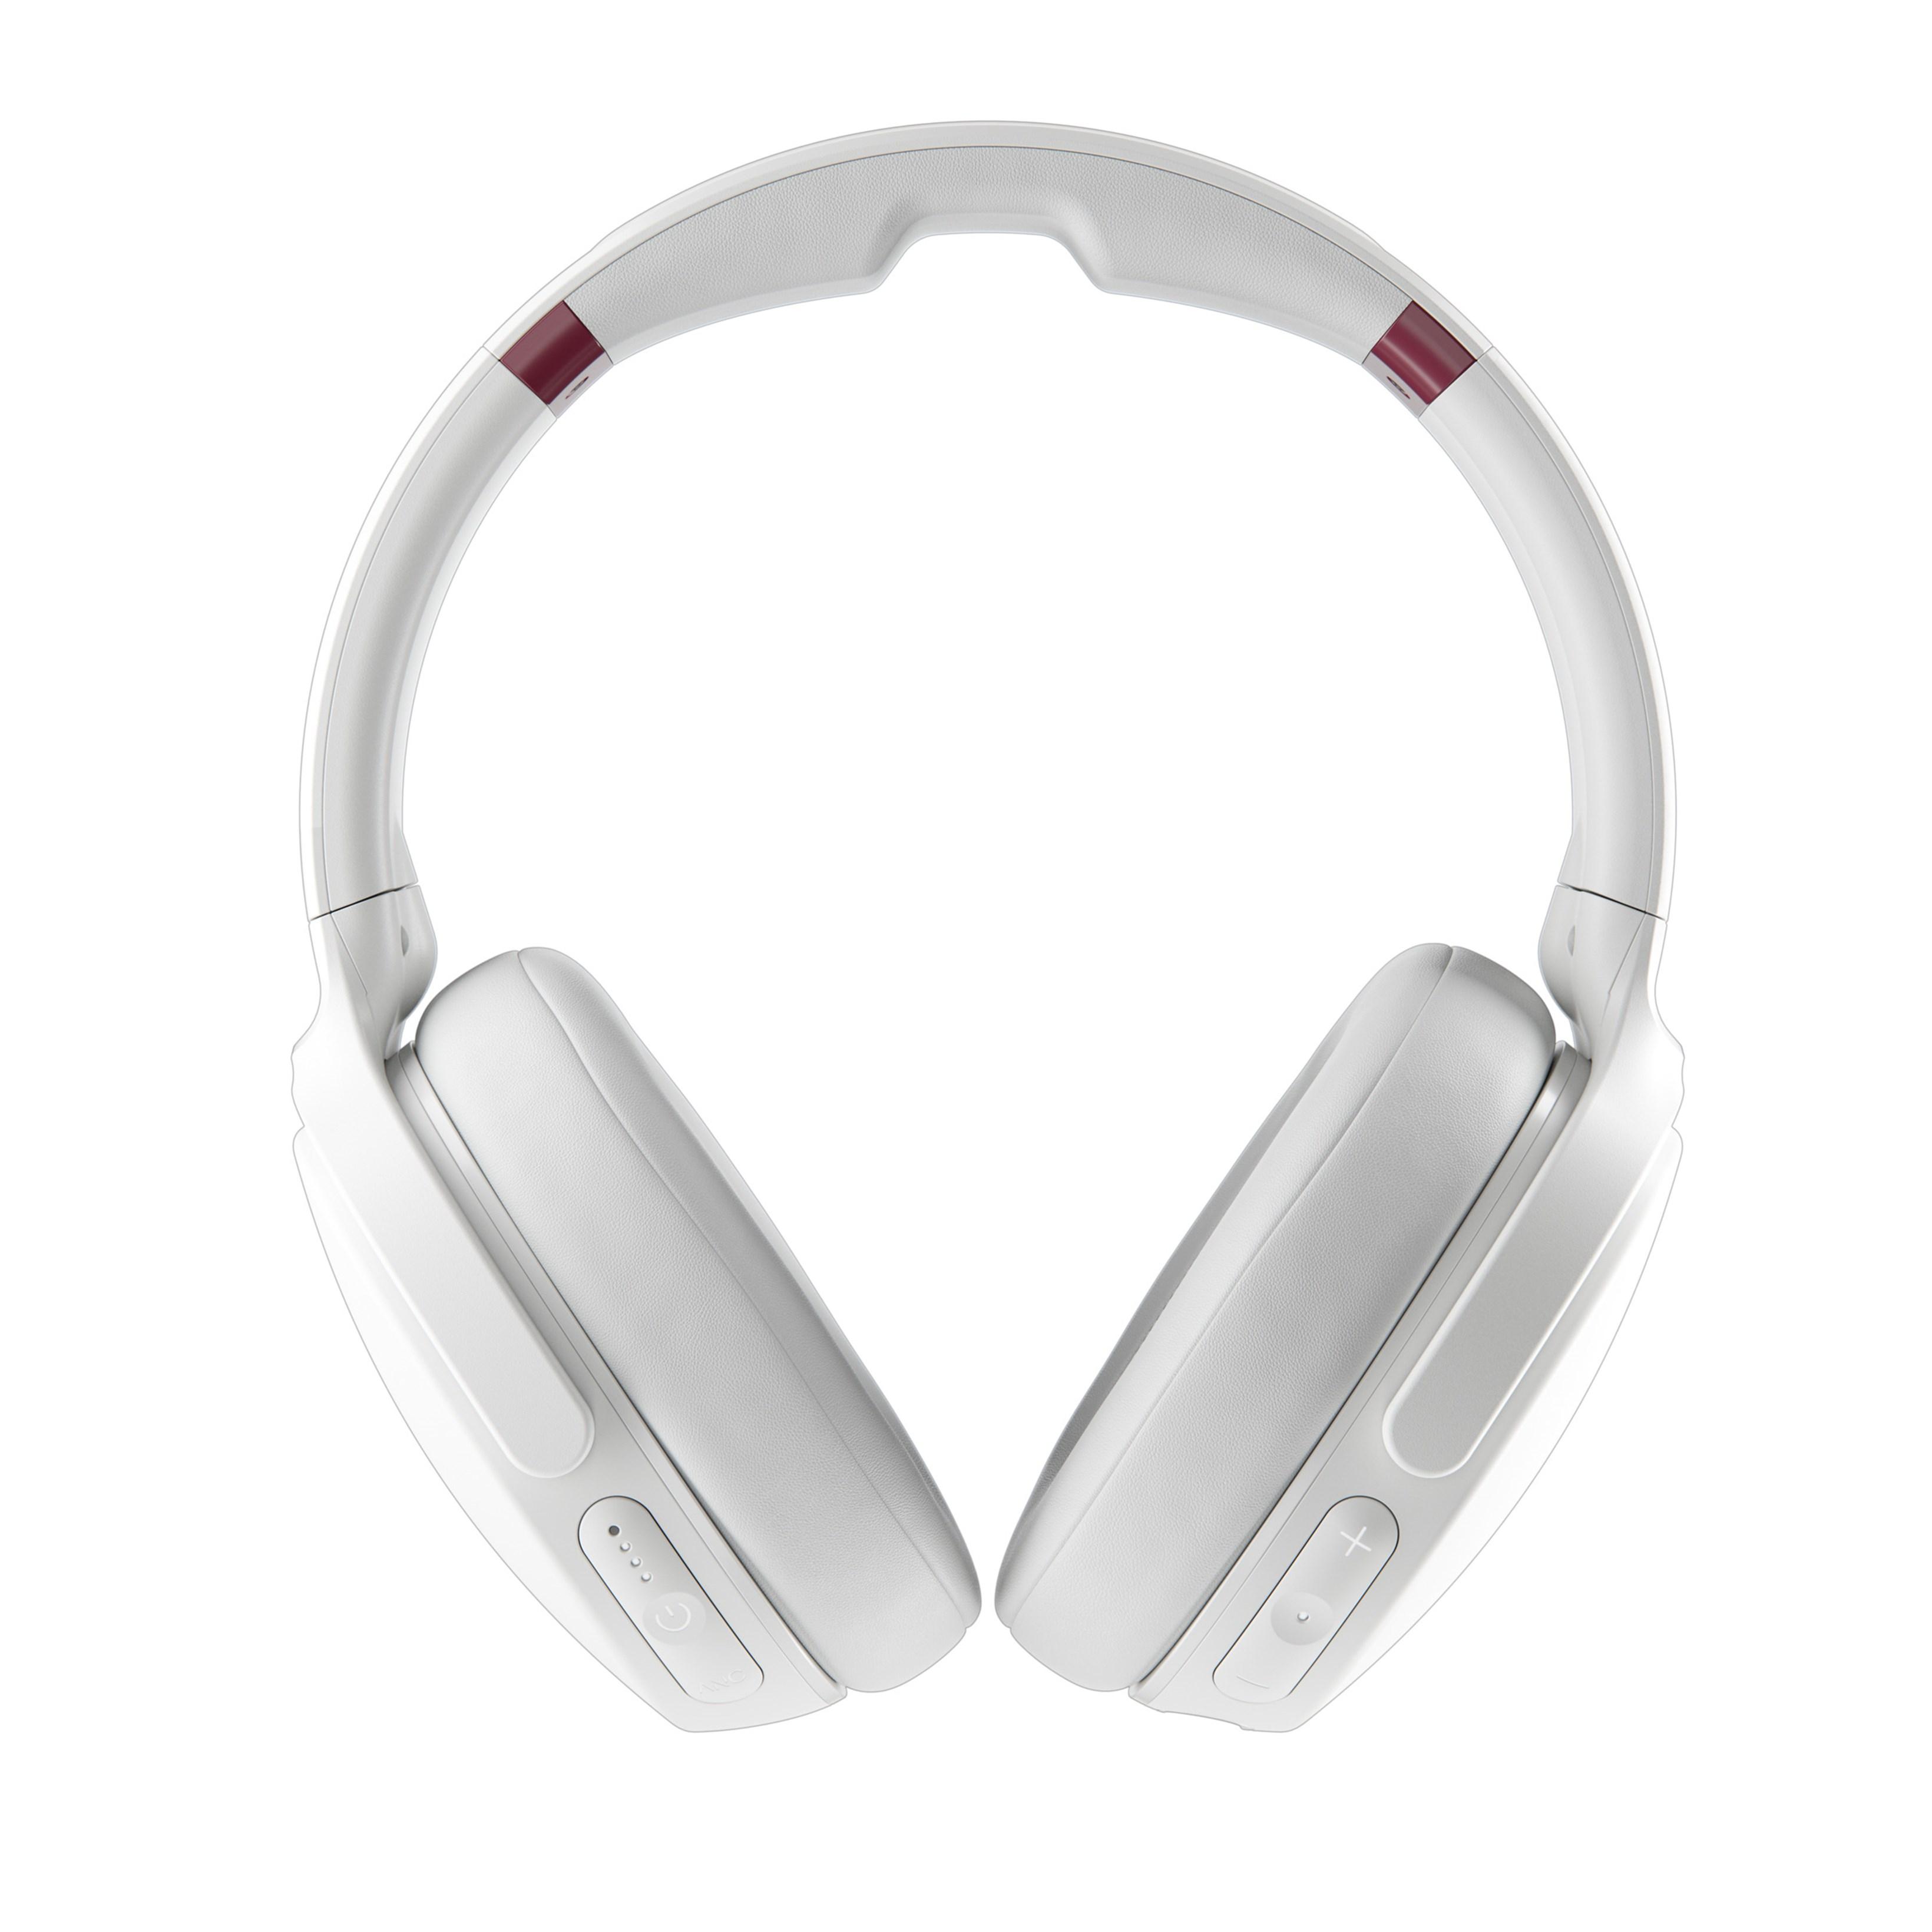 Skullcandy Venue Vice/Grey/Crimson Active Noise Cancelling Bluetooth Headphones - 1